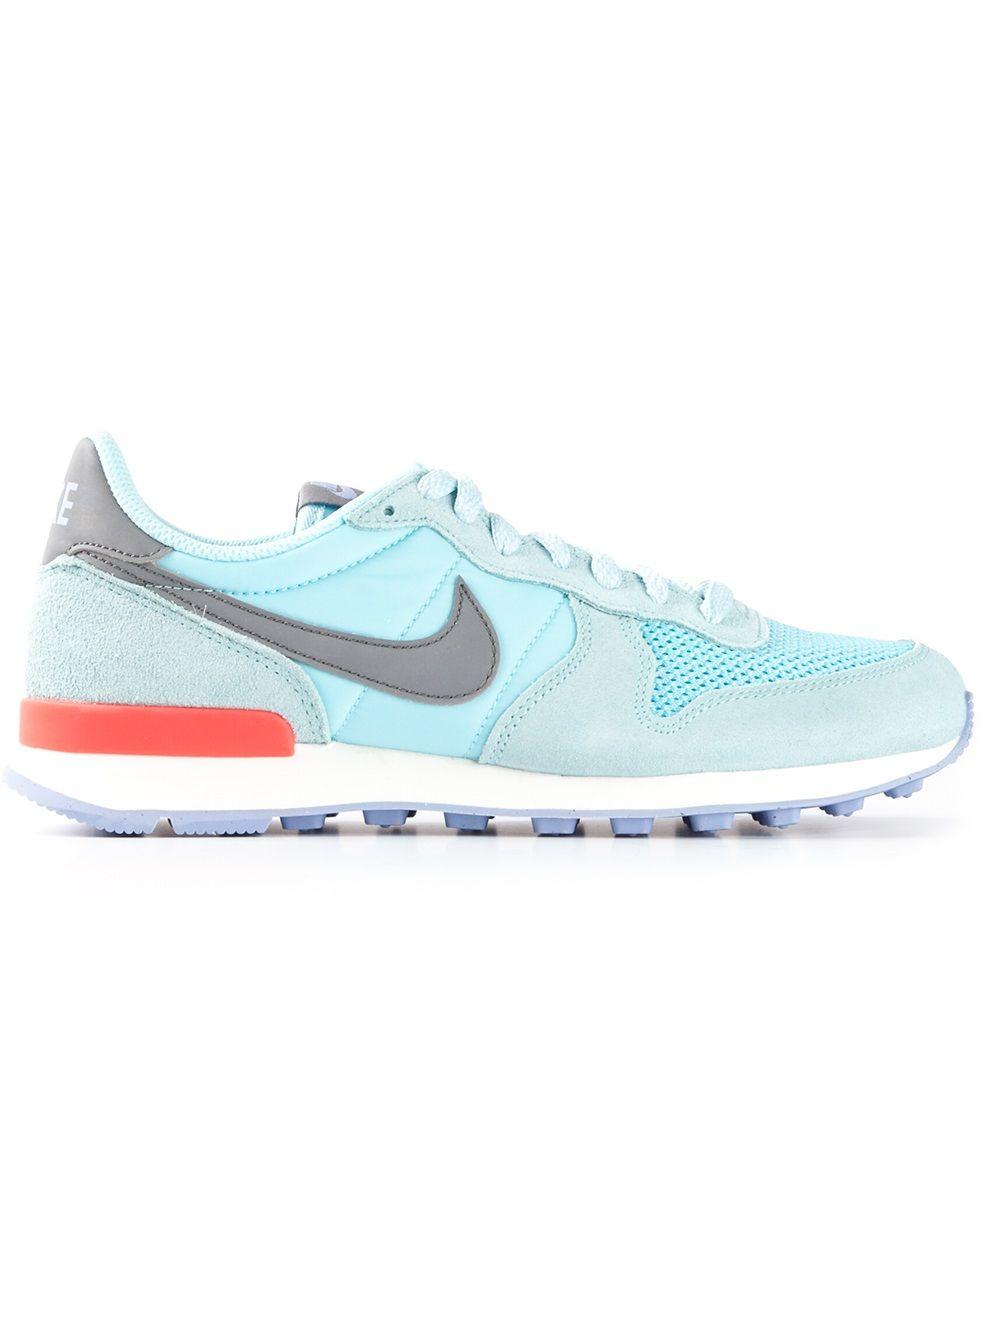 best authentic 353d5 c2fc6 Nike Internationalist Blue Trainers Blue Trainers, Nike Internationalist,  Gym Classes, Gym Style,